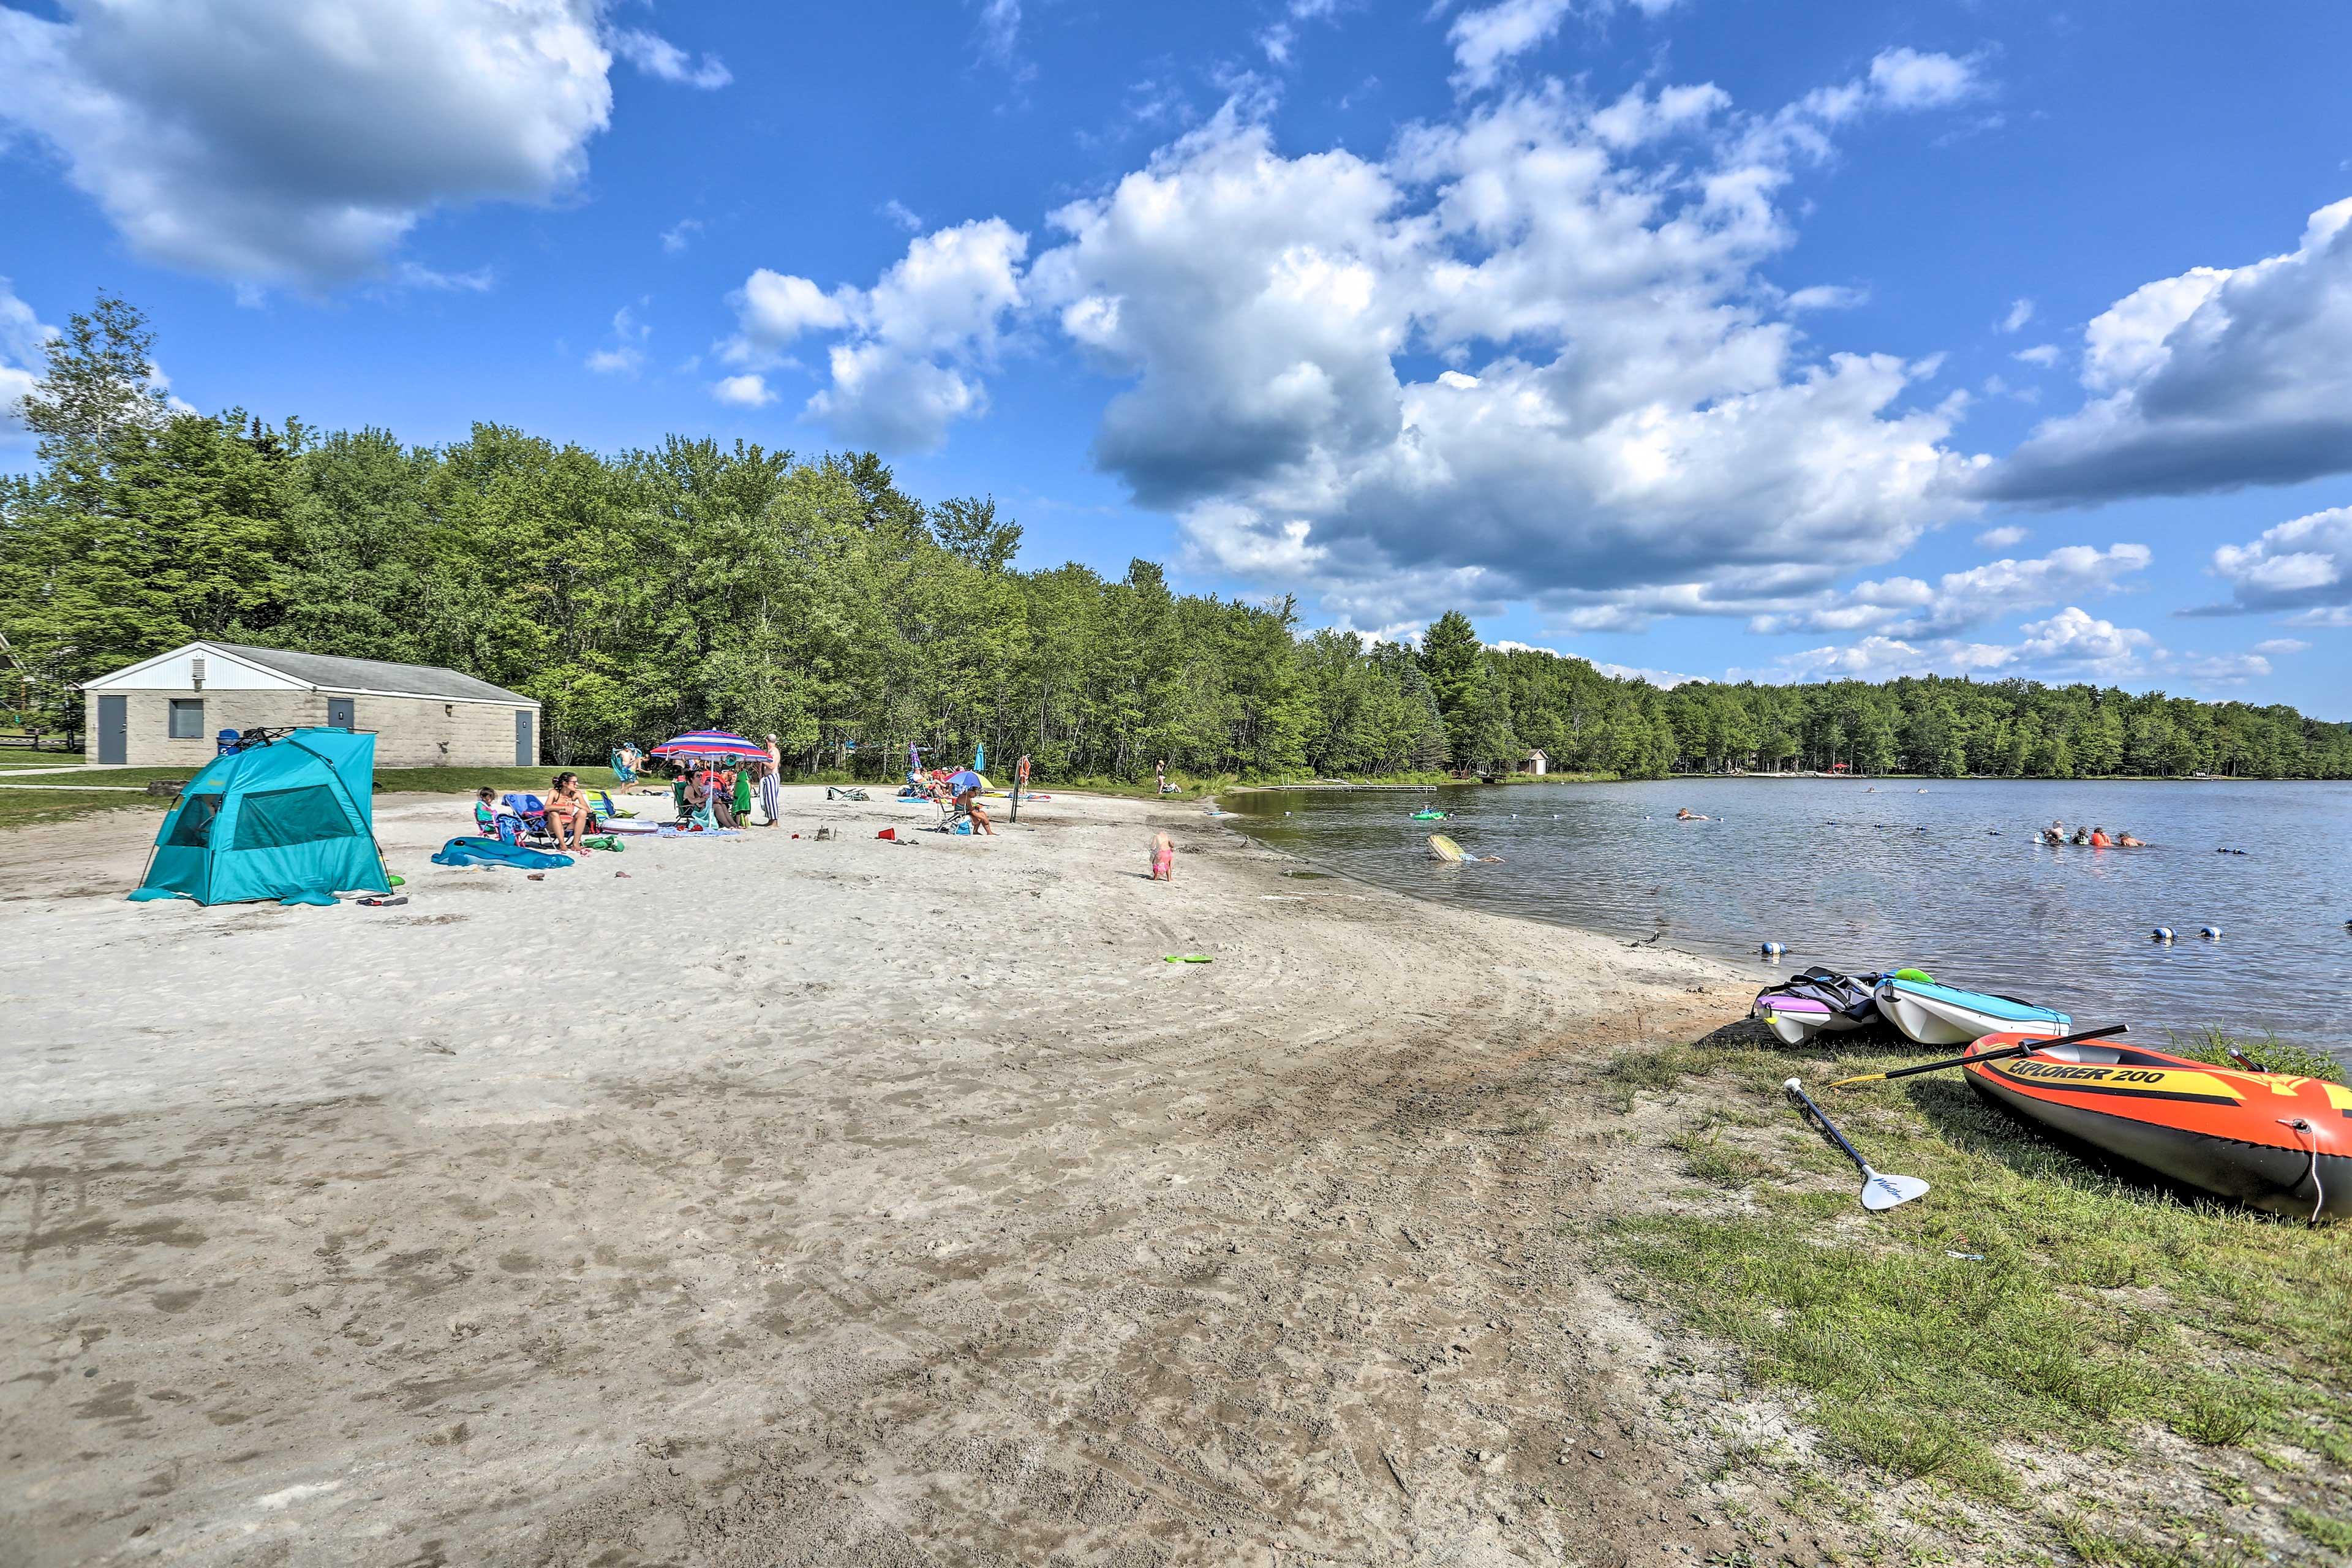 The beach area has a designated swimming area.